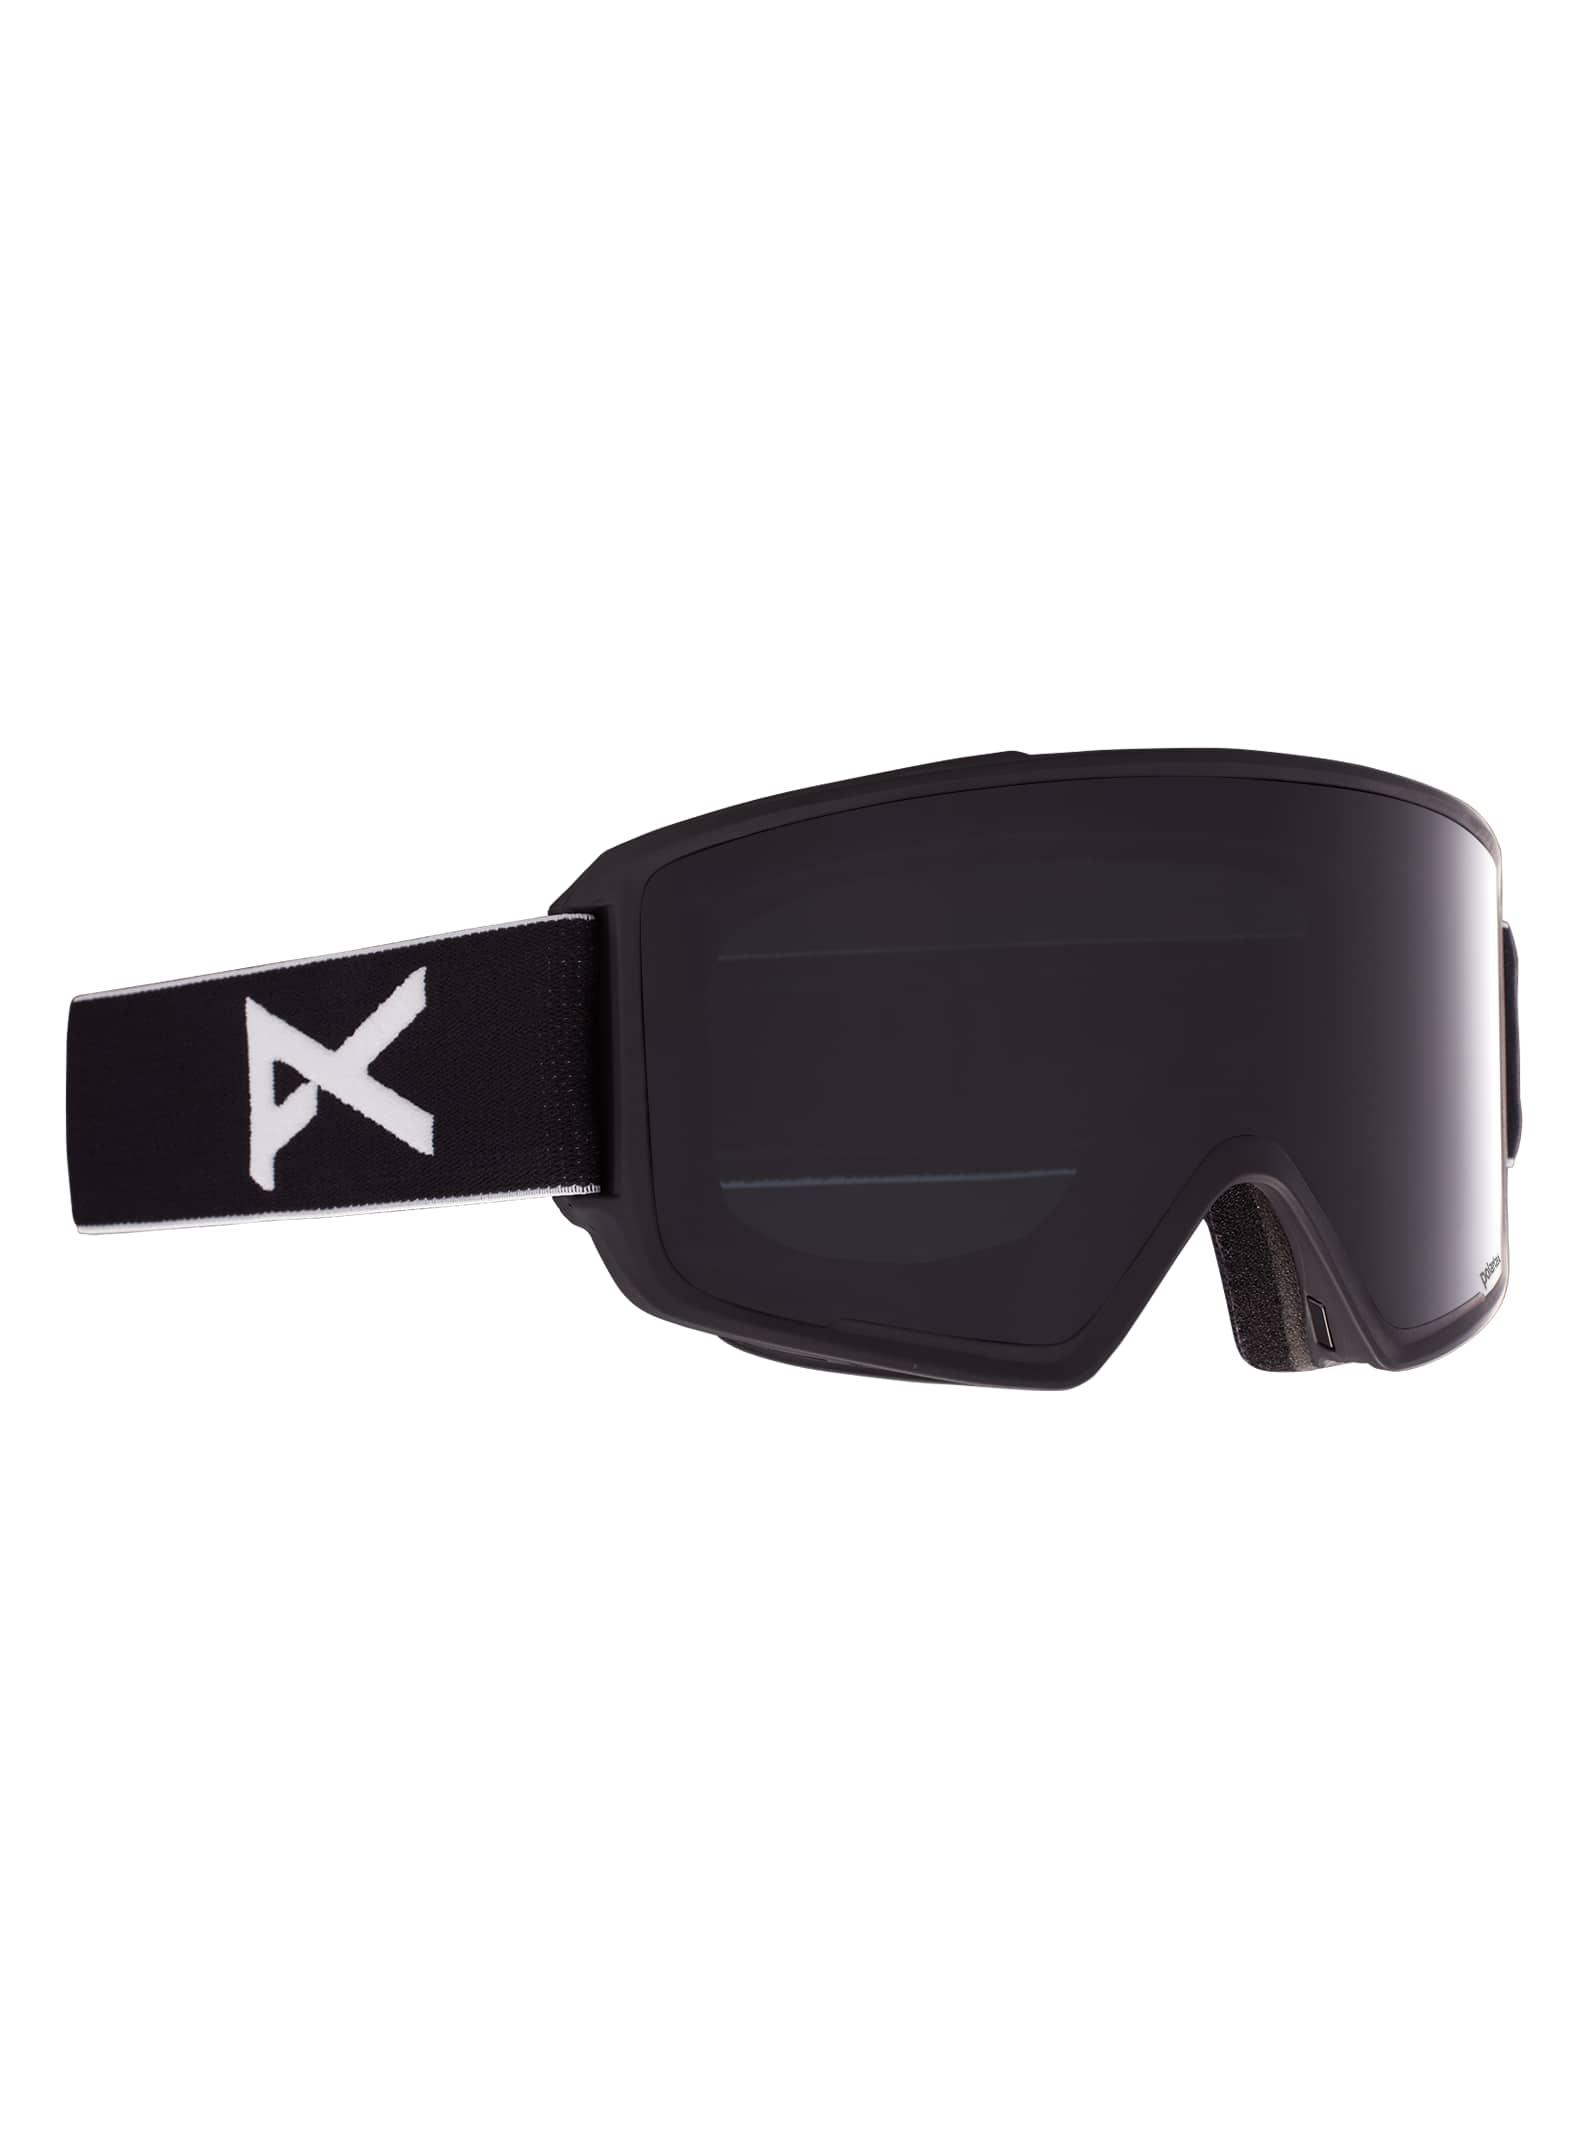 Anon M3 polariserade skidglasögon för herrar + reservlins, Frame: Black, Lens: Polar Smoke, Spare Lens: Blue Lagoon